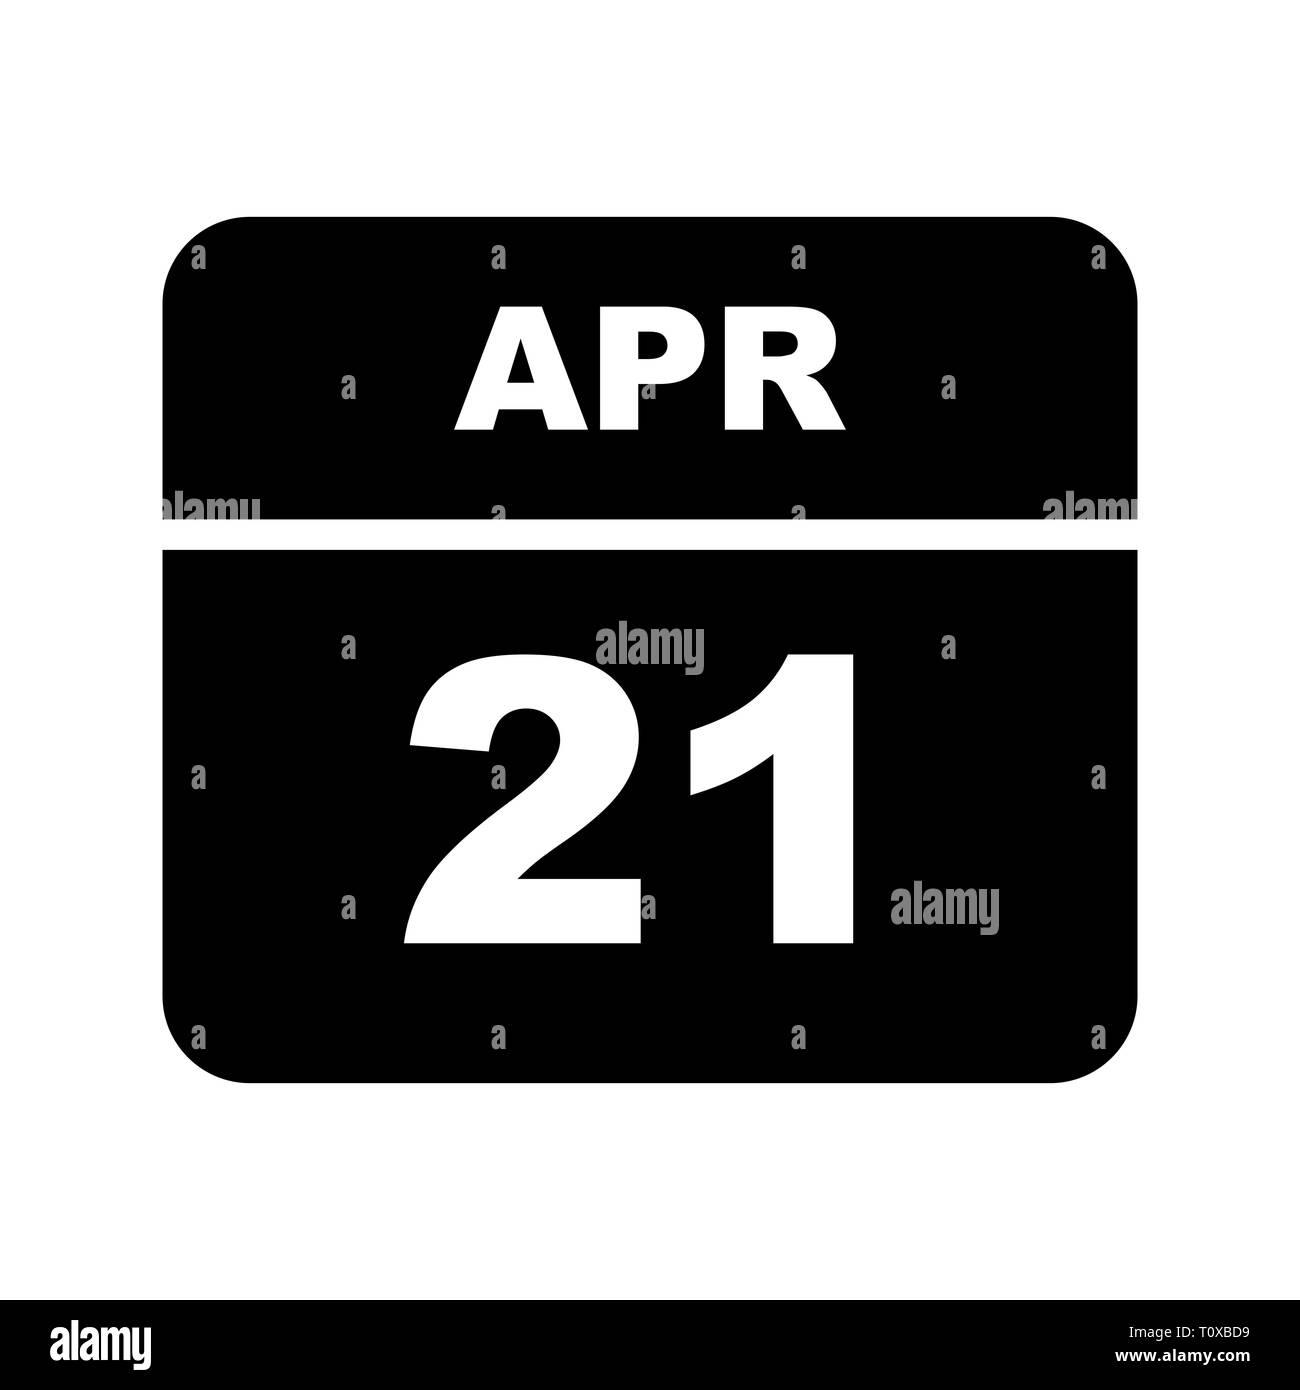 April 21st Date on a Single Day Calendar - Stock Image